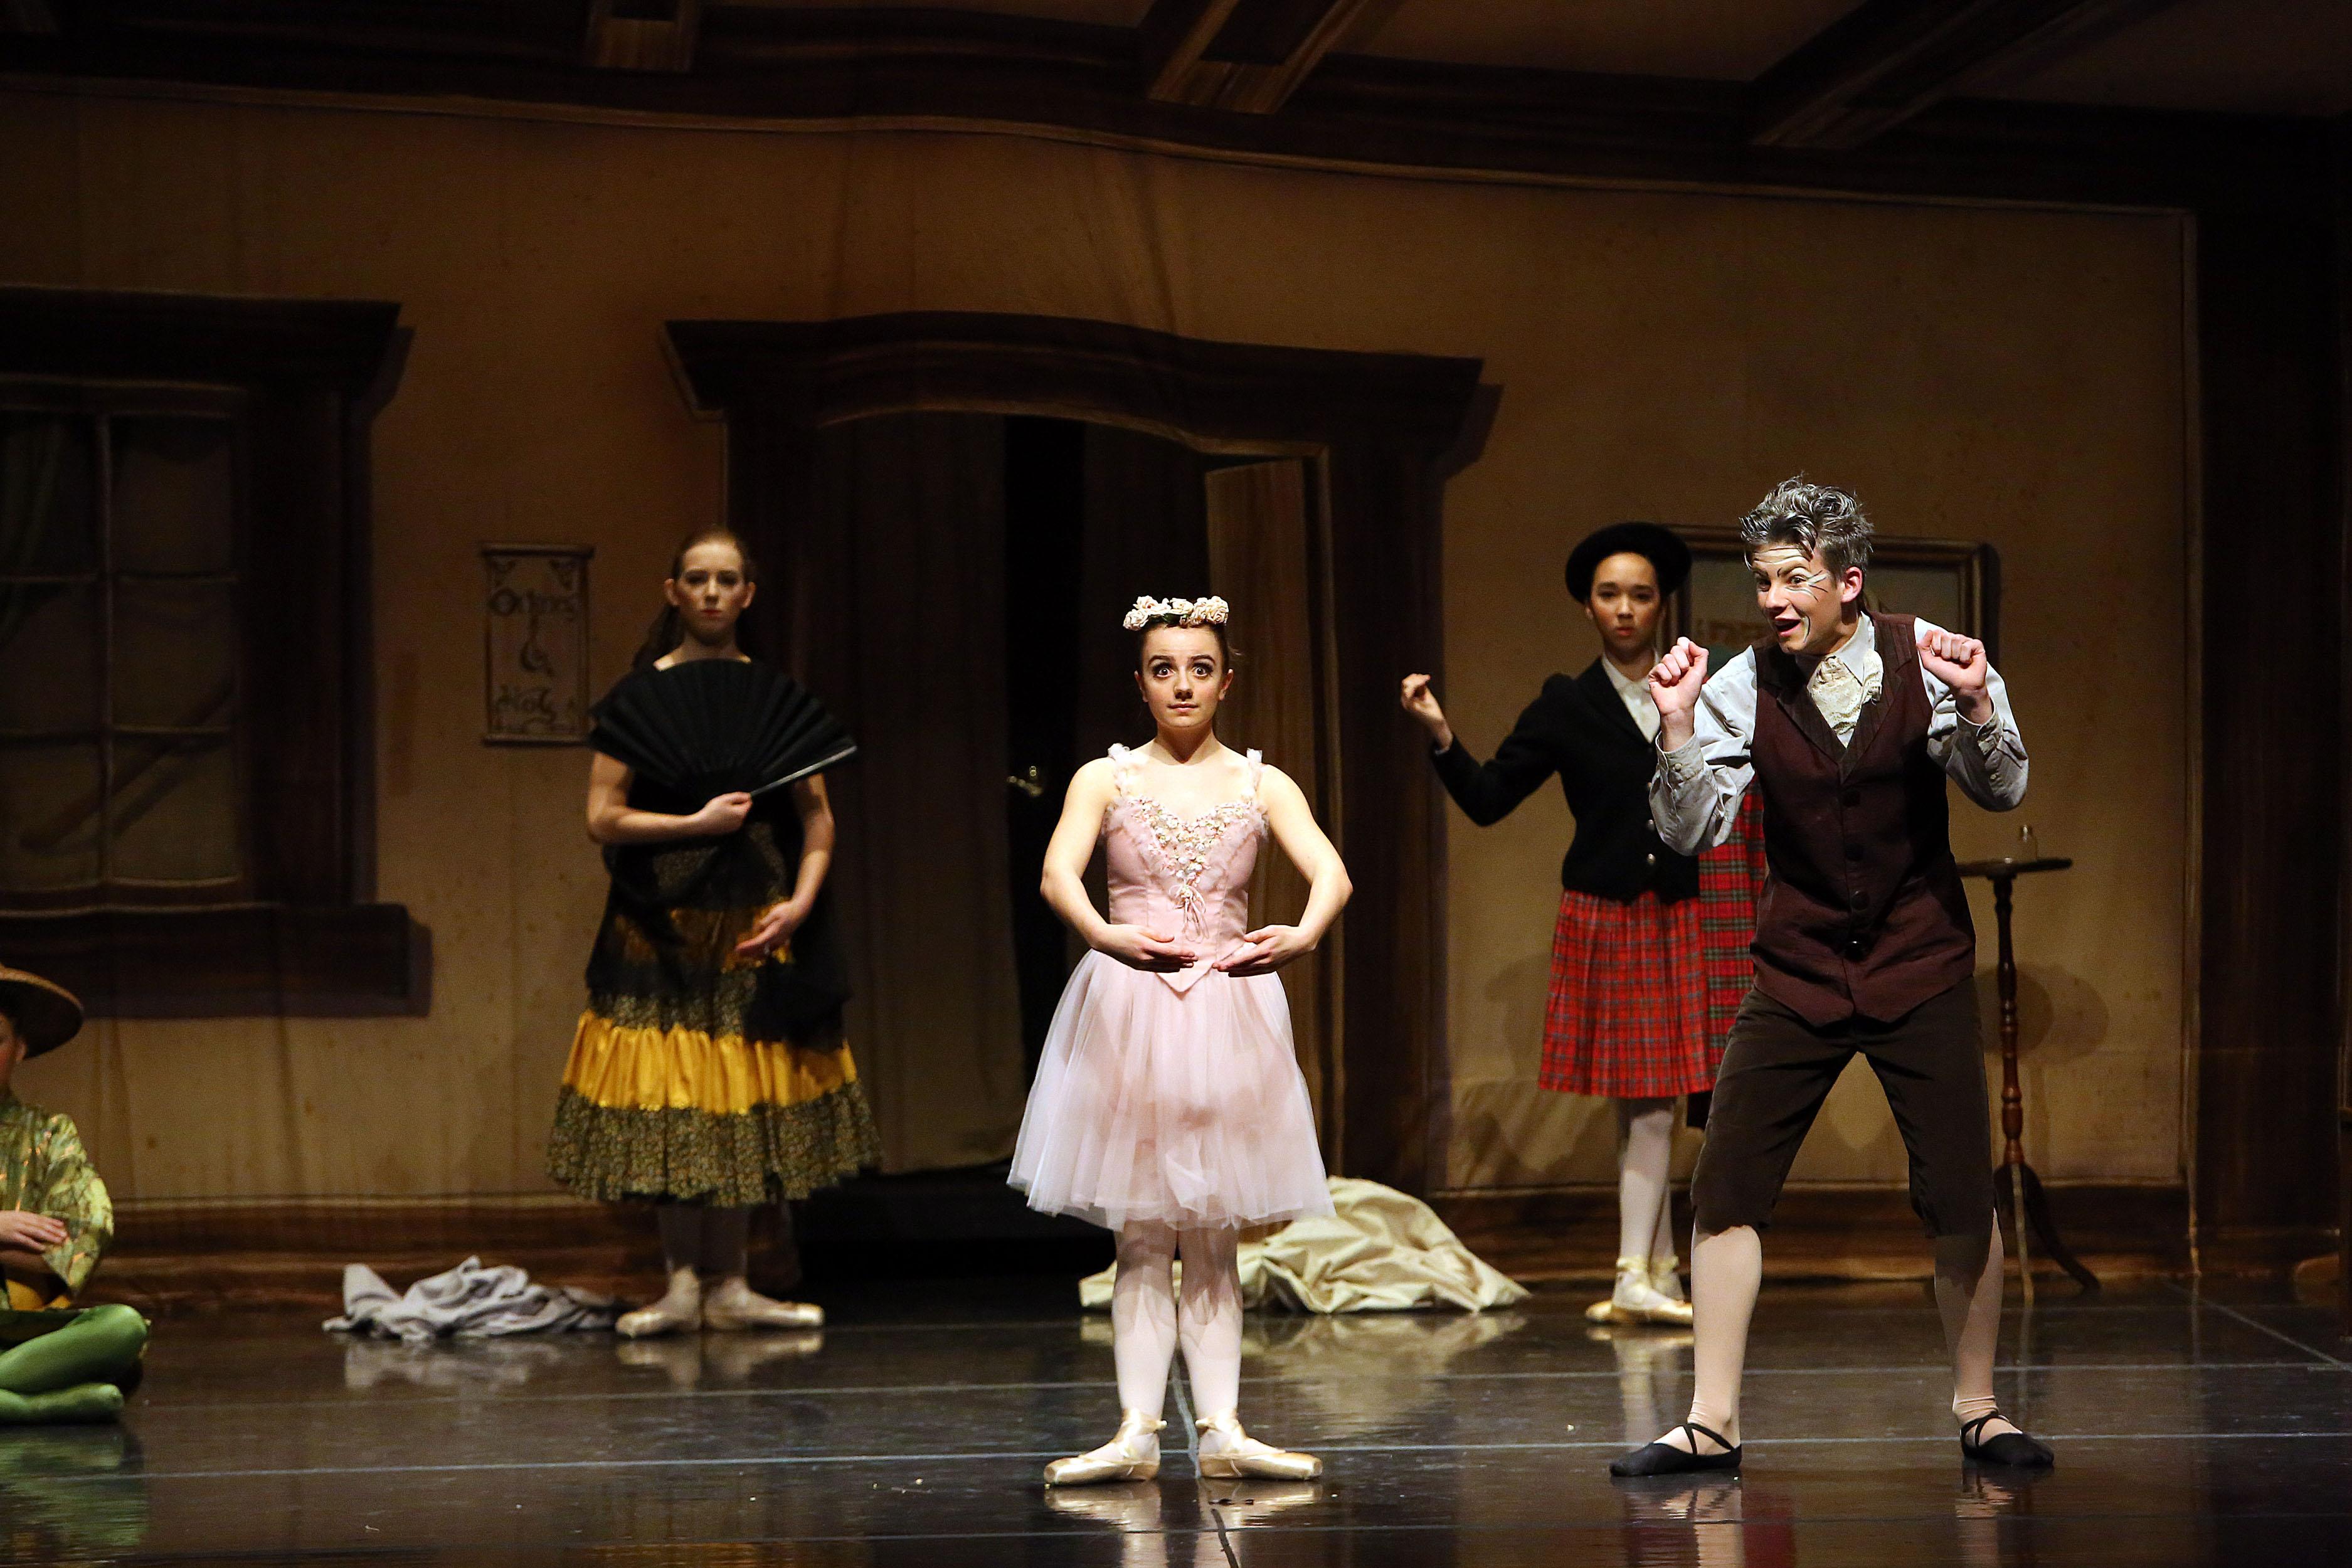 bd06263a5 CARE Ballet - Grand Rapids Non-Profit Ballet Company and Dance School